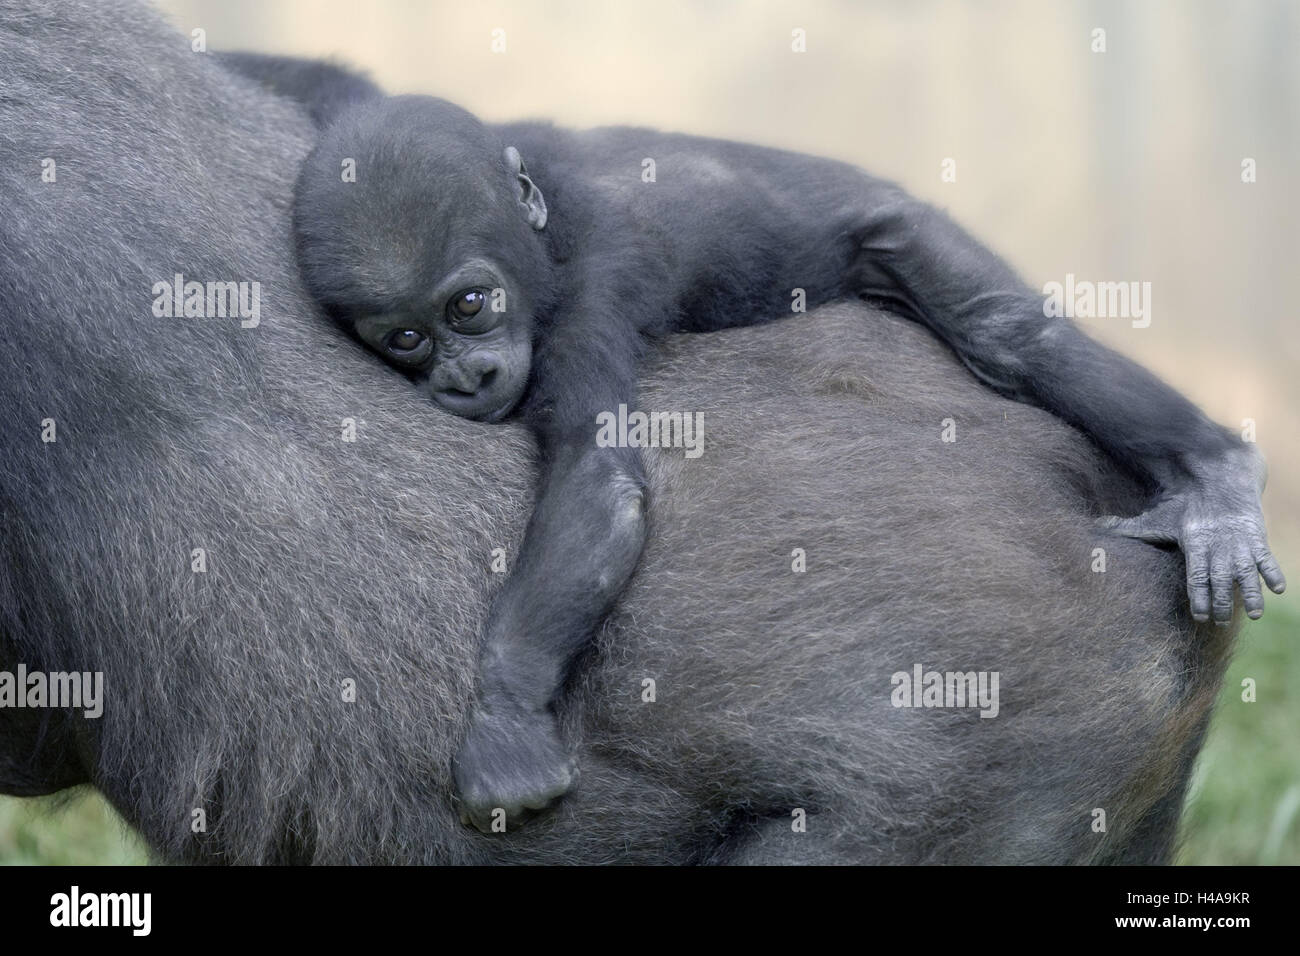 Plain gorilla, gorilla gorilla gorilla, mother animal, back, detail, young animal, hold on, animal world, animals, - Stock Image